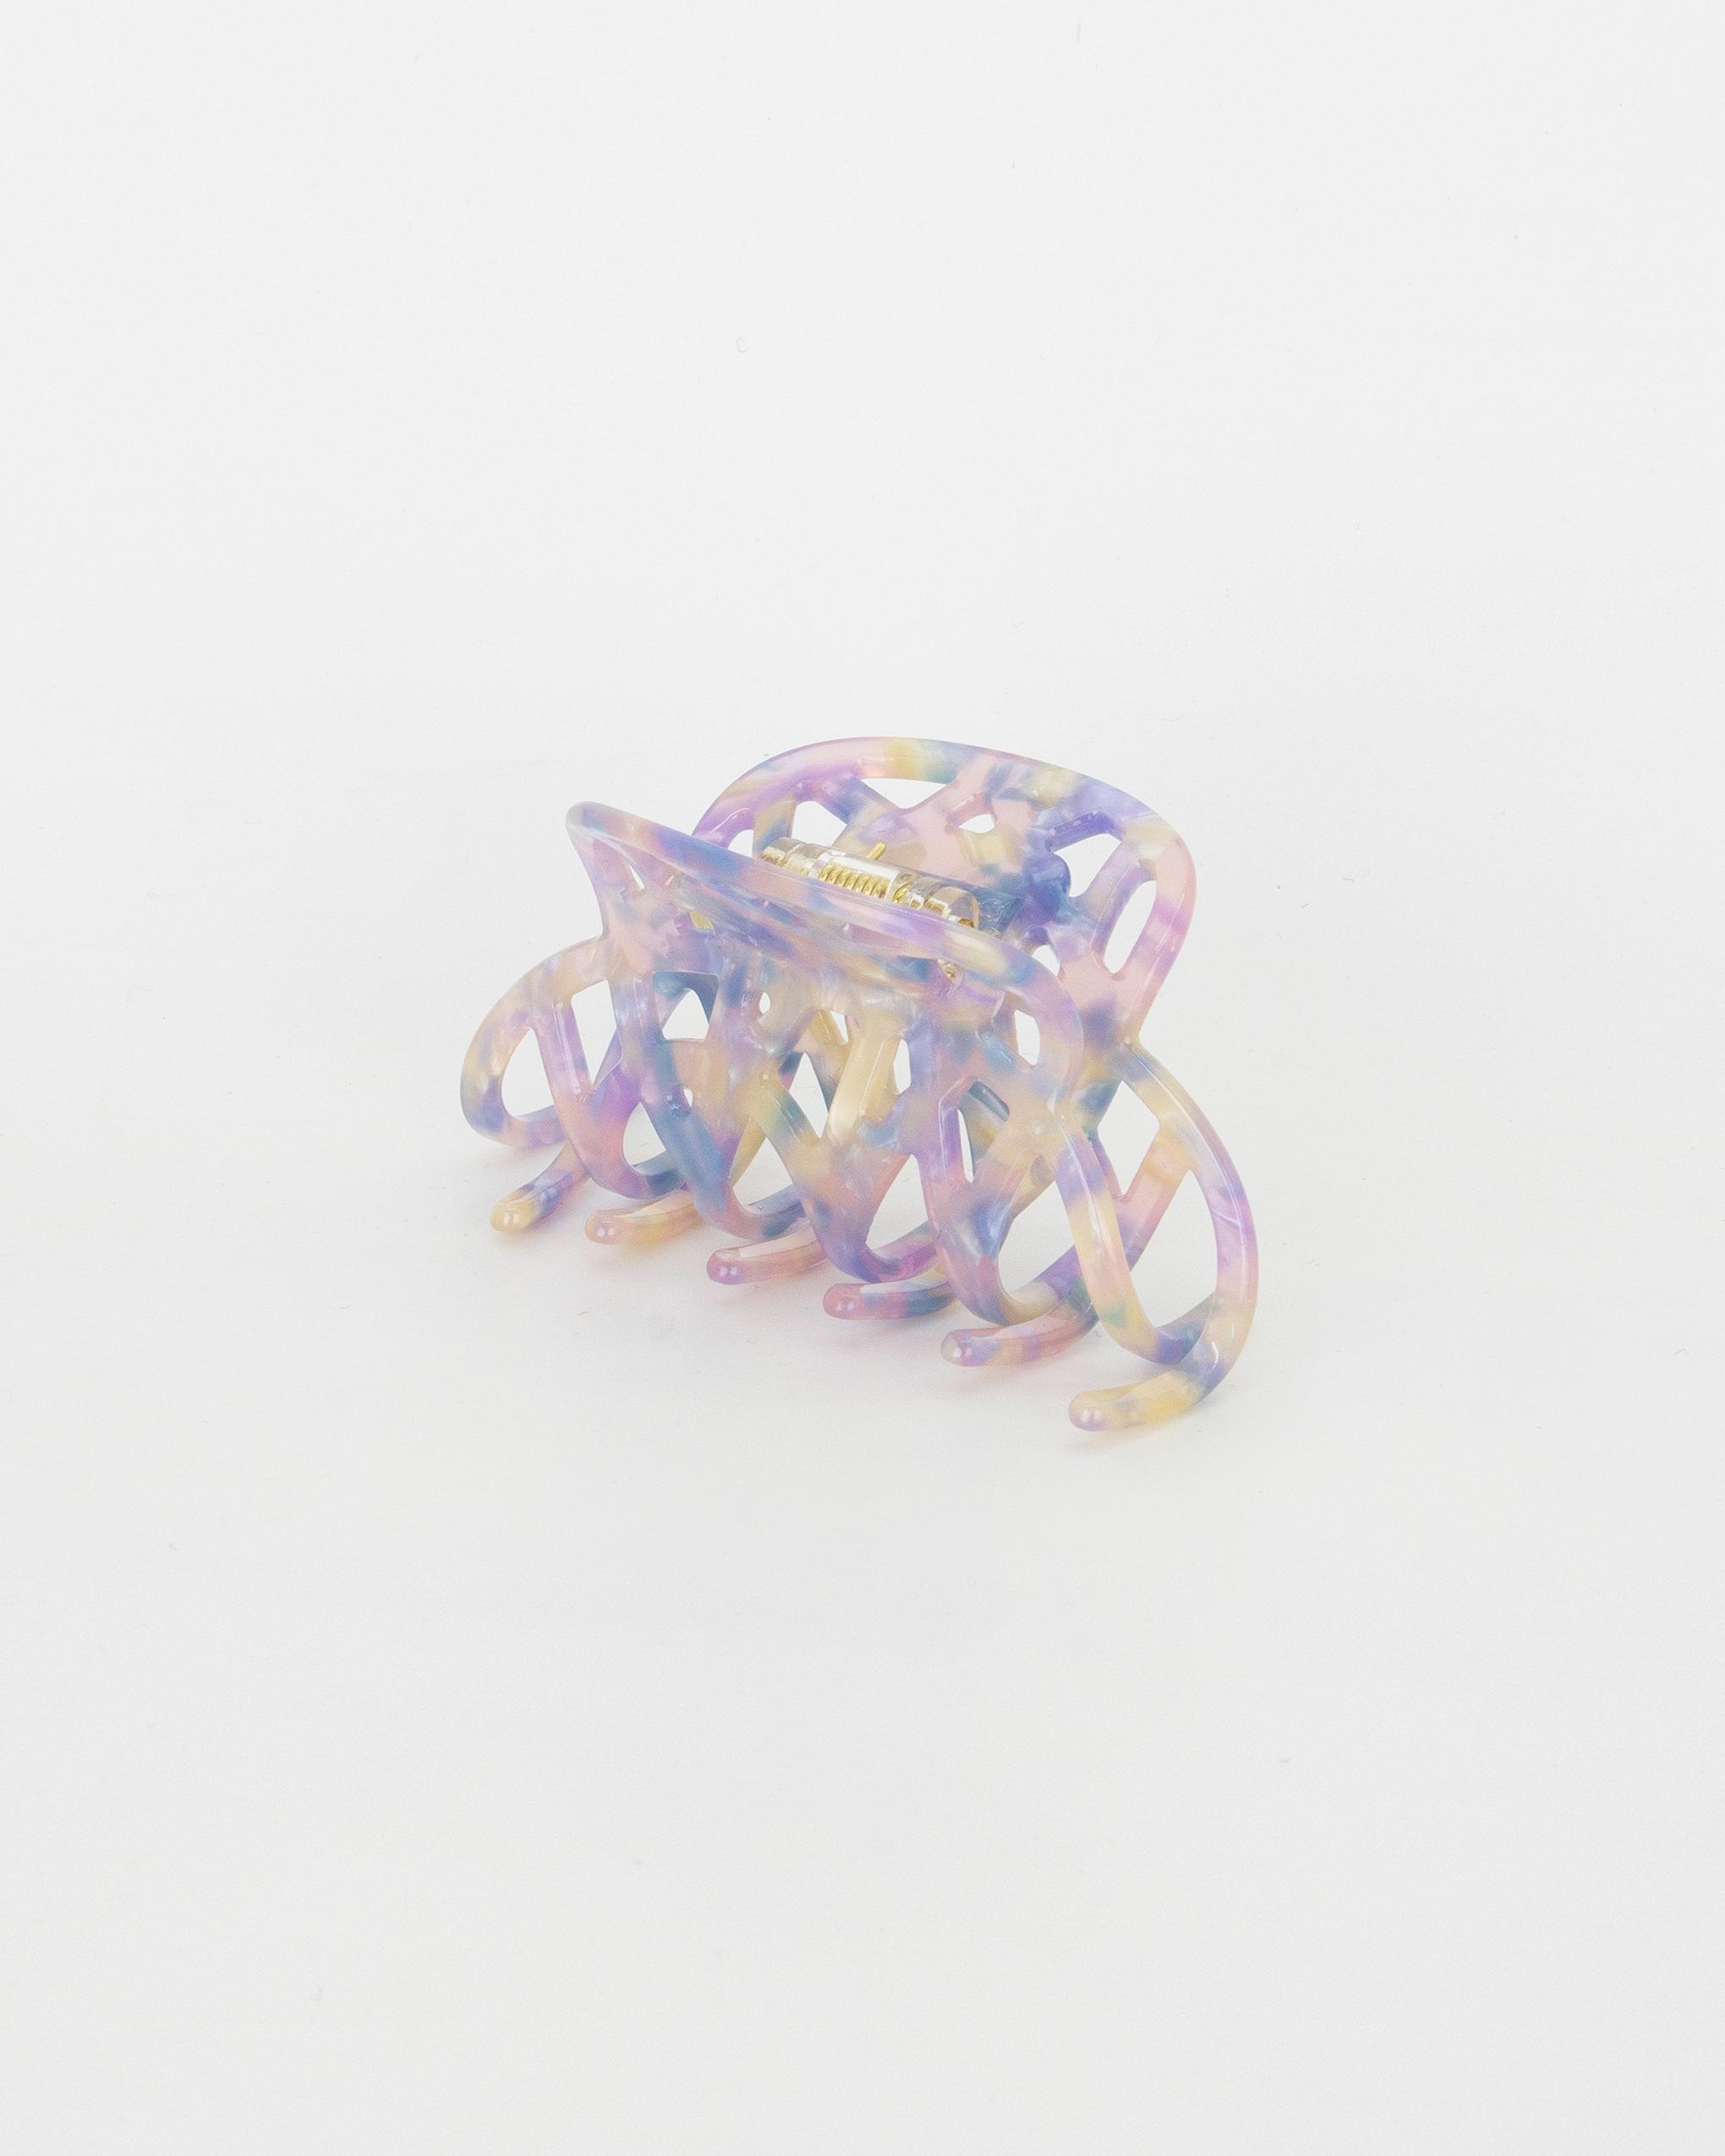 Emin + Paul parma violet lattice hair claw.